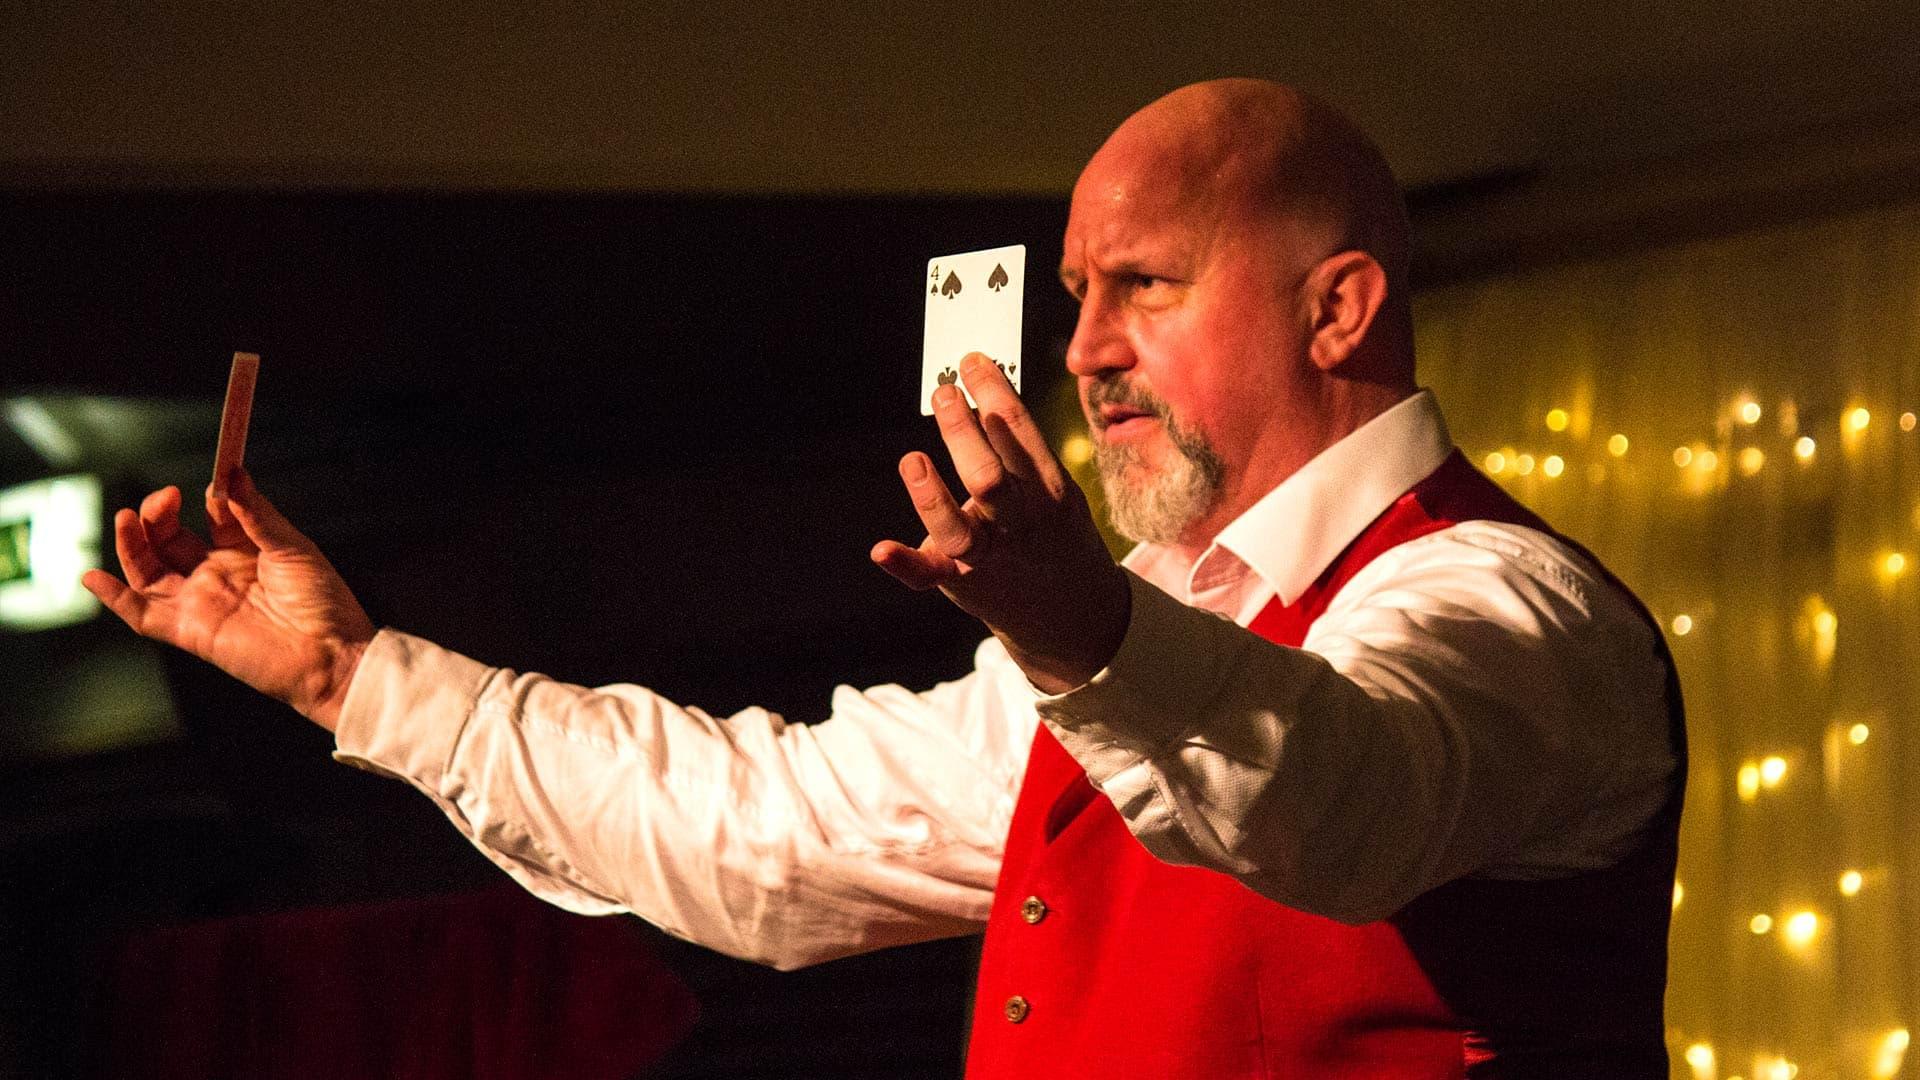 Bristol Magician the Great Baldini is an award-winning member of the Magic Circle